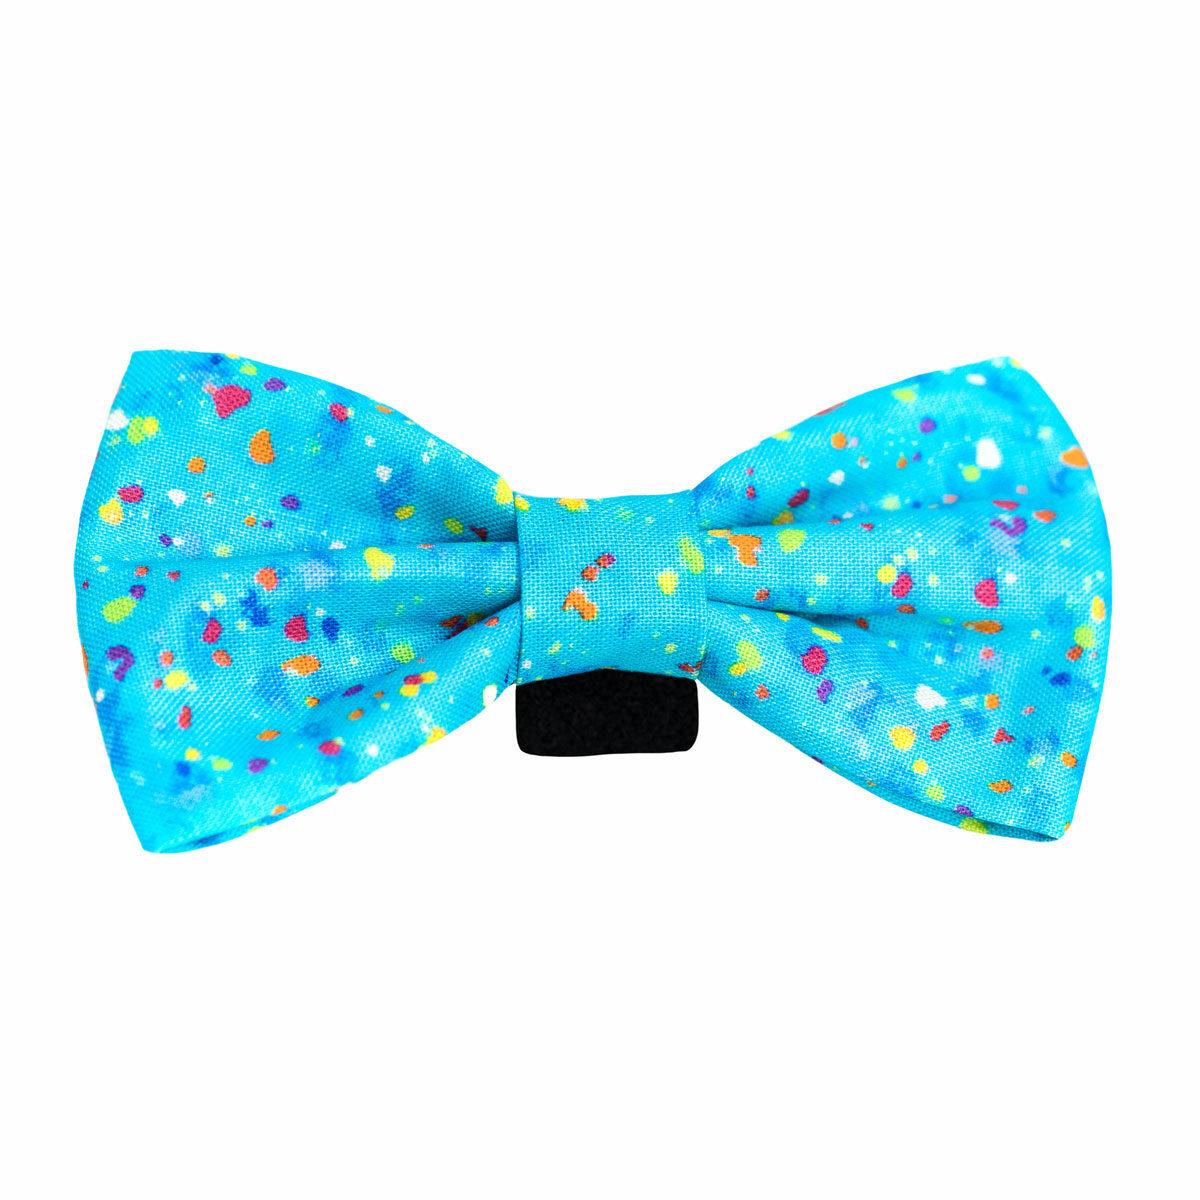 Halas Paws Dog Bow Tie (Confetti Blue)